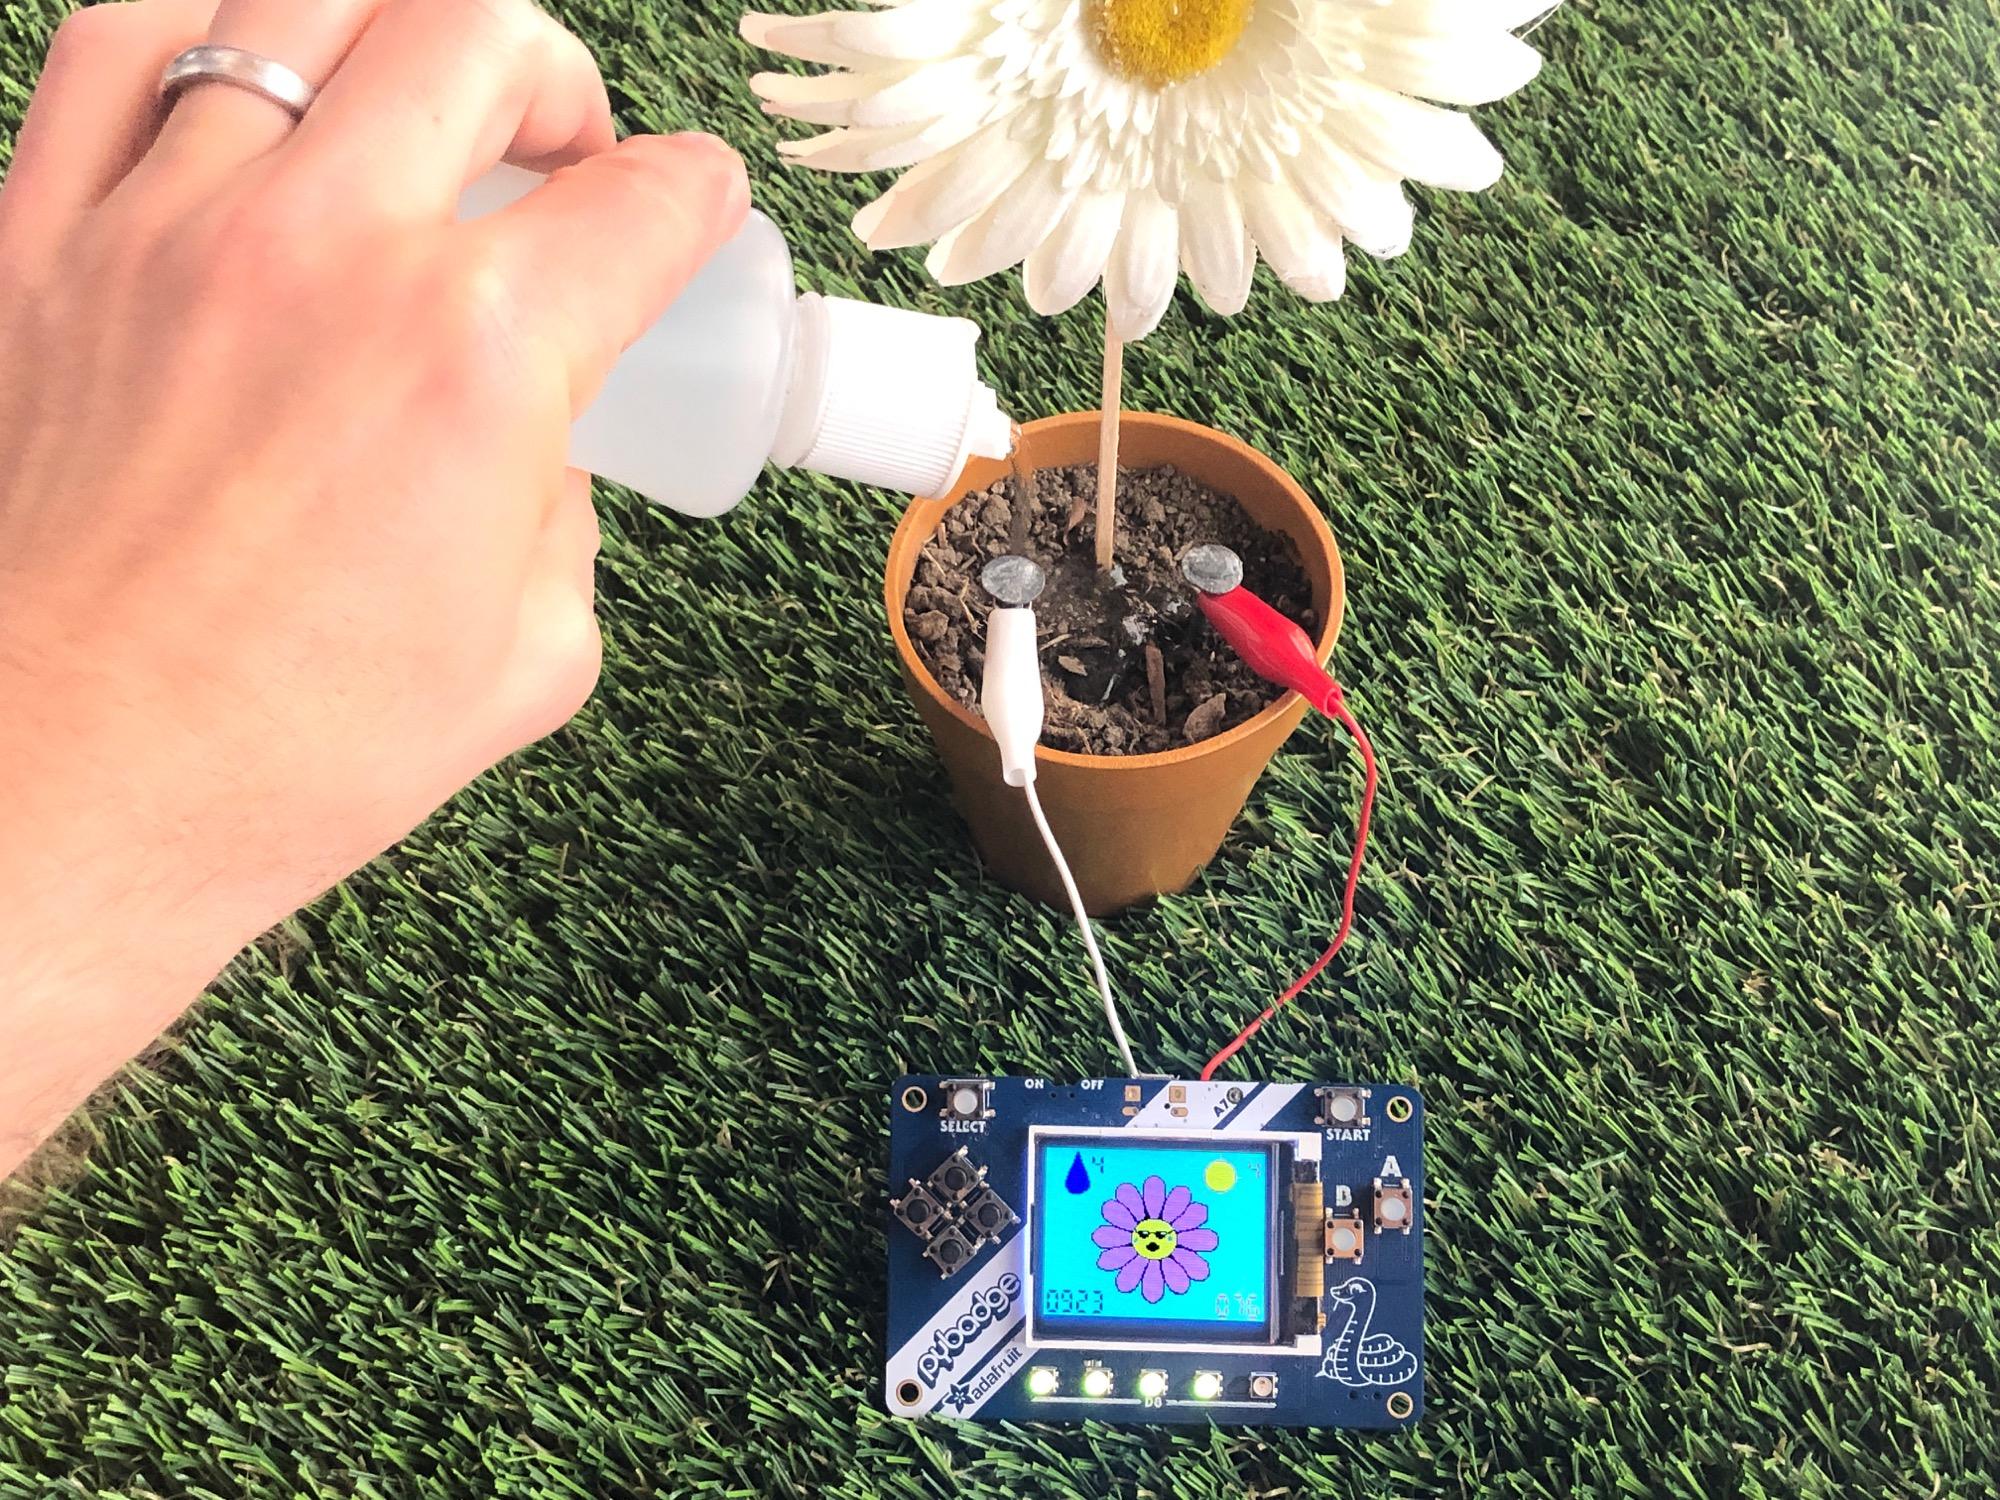 sensors_plantUse02_copy.jpg